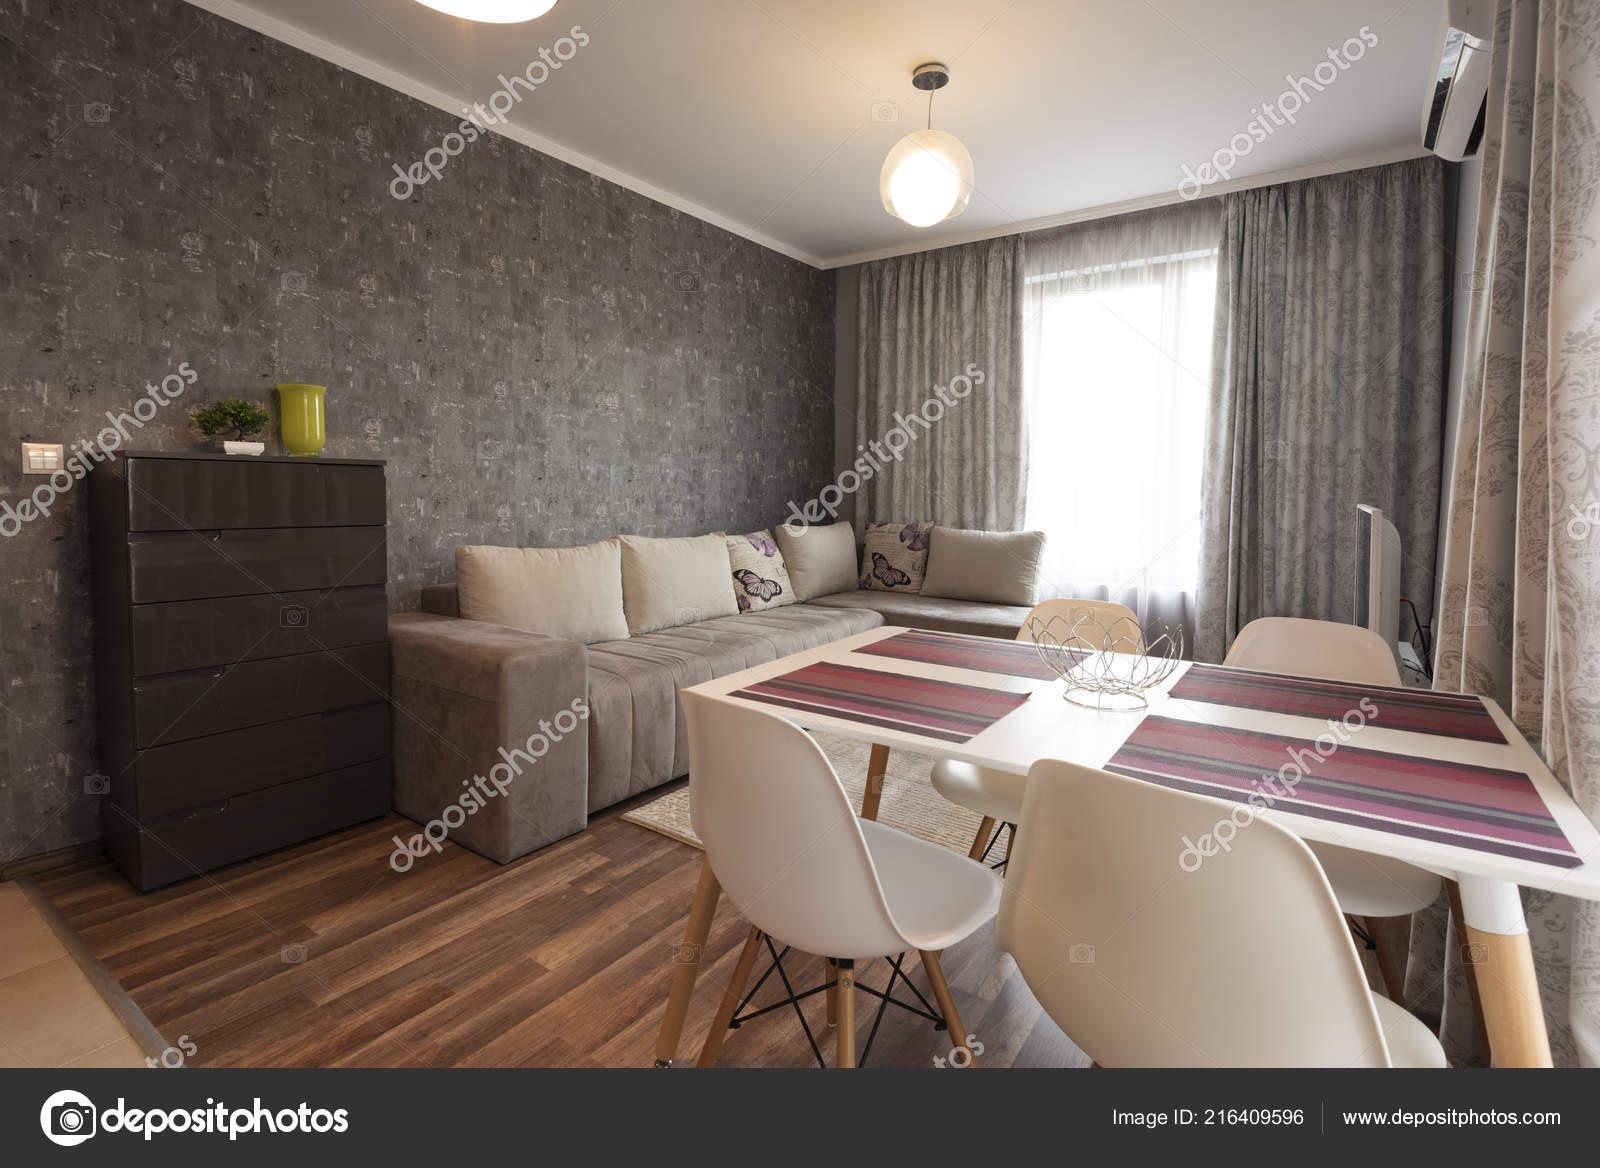 . Modern Bright Cozy Living Room Interior Design Sofa Dining Table